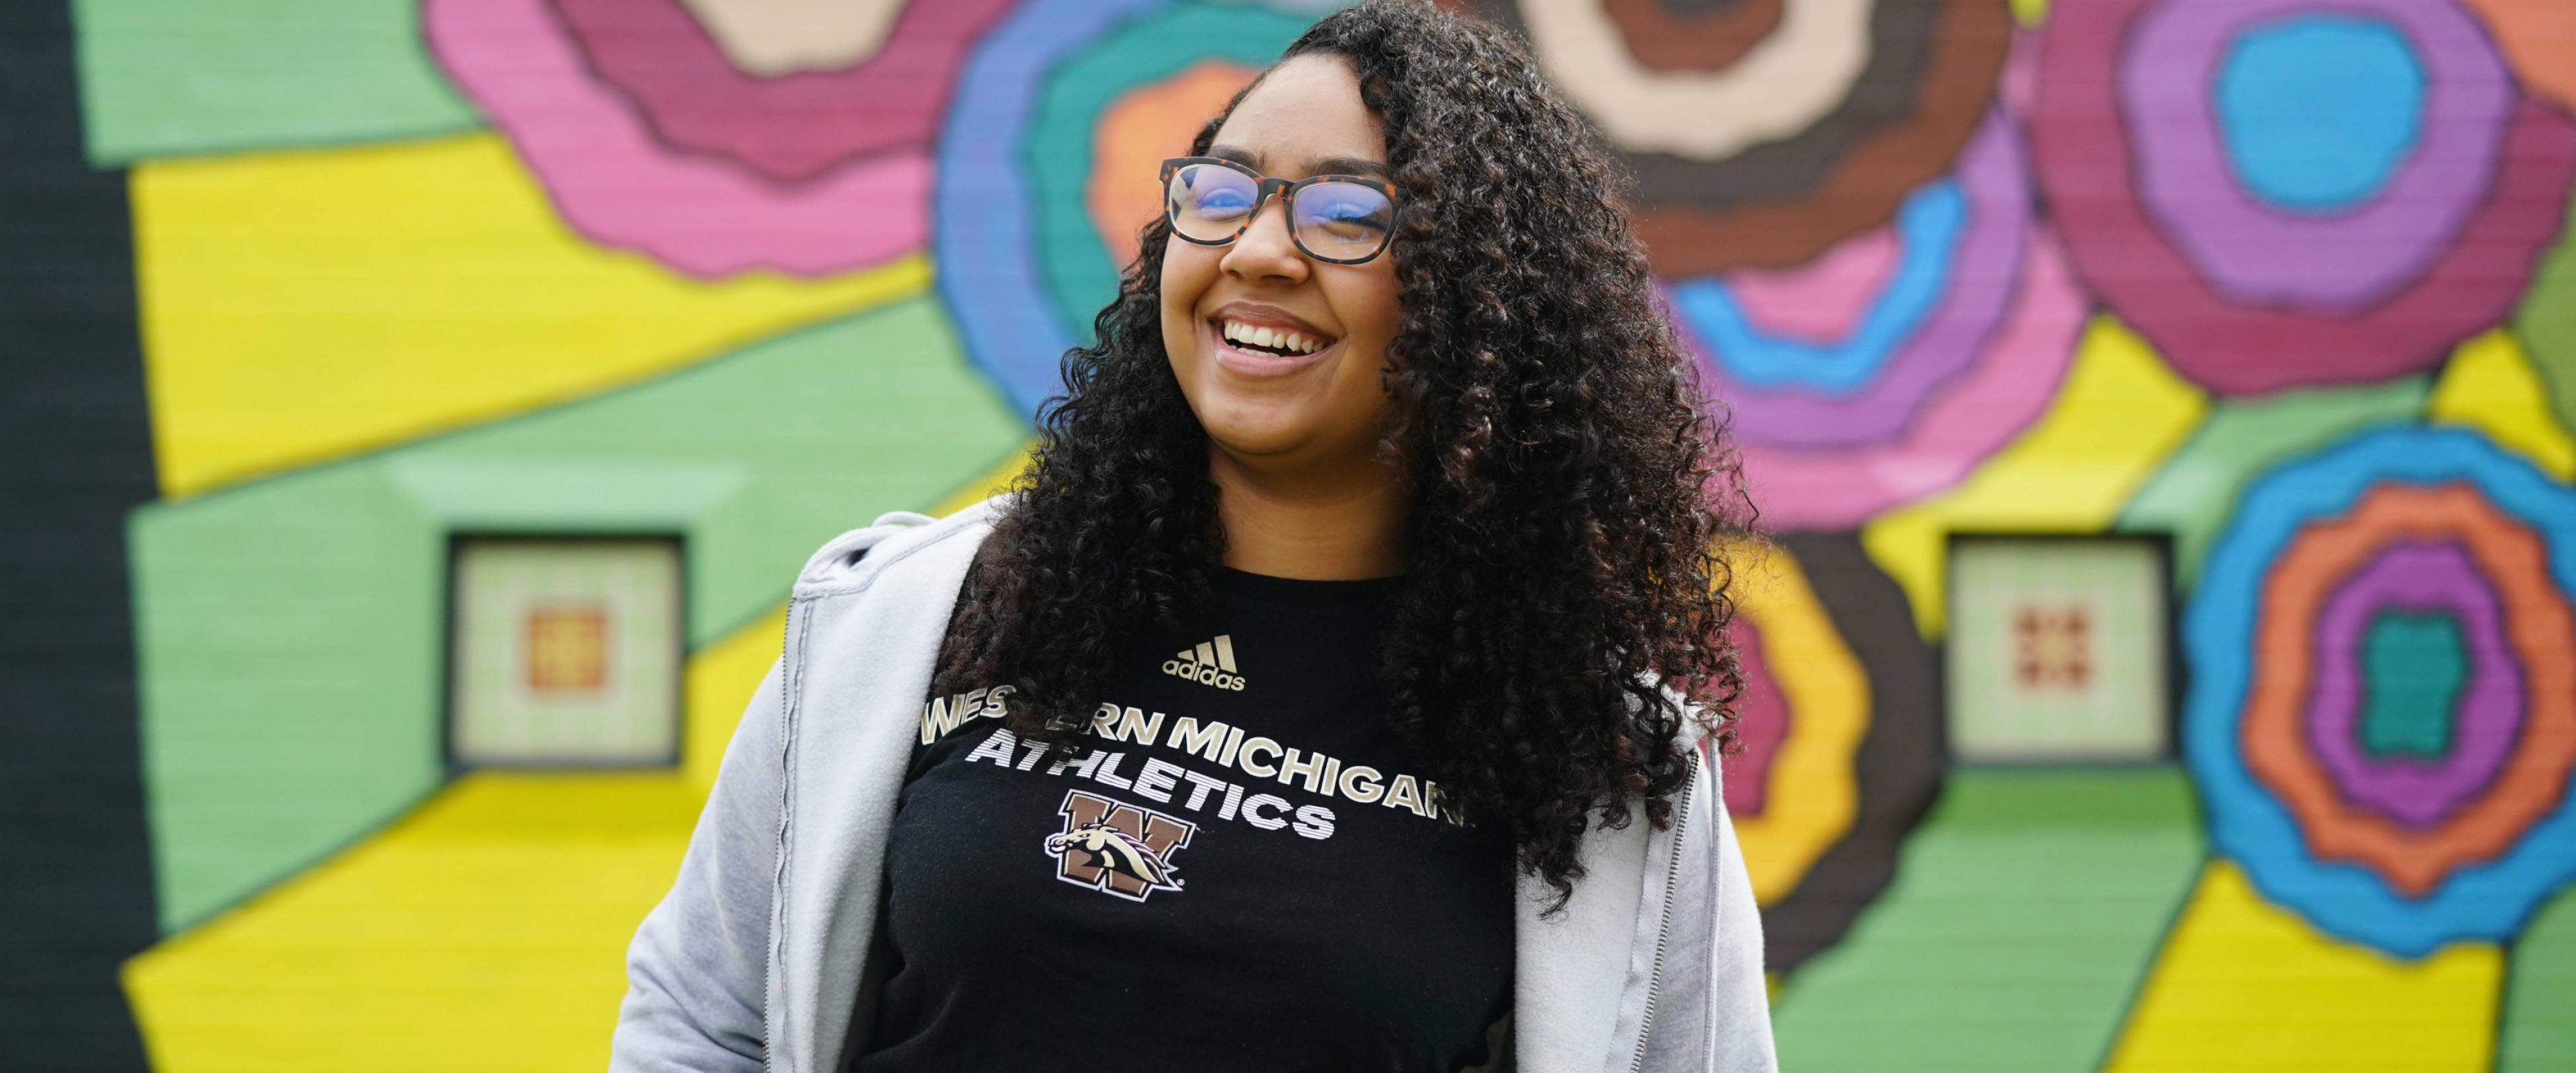 Breyana Wilson in front of colorful mural